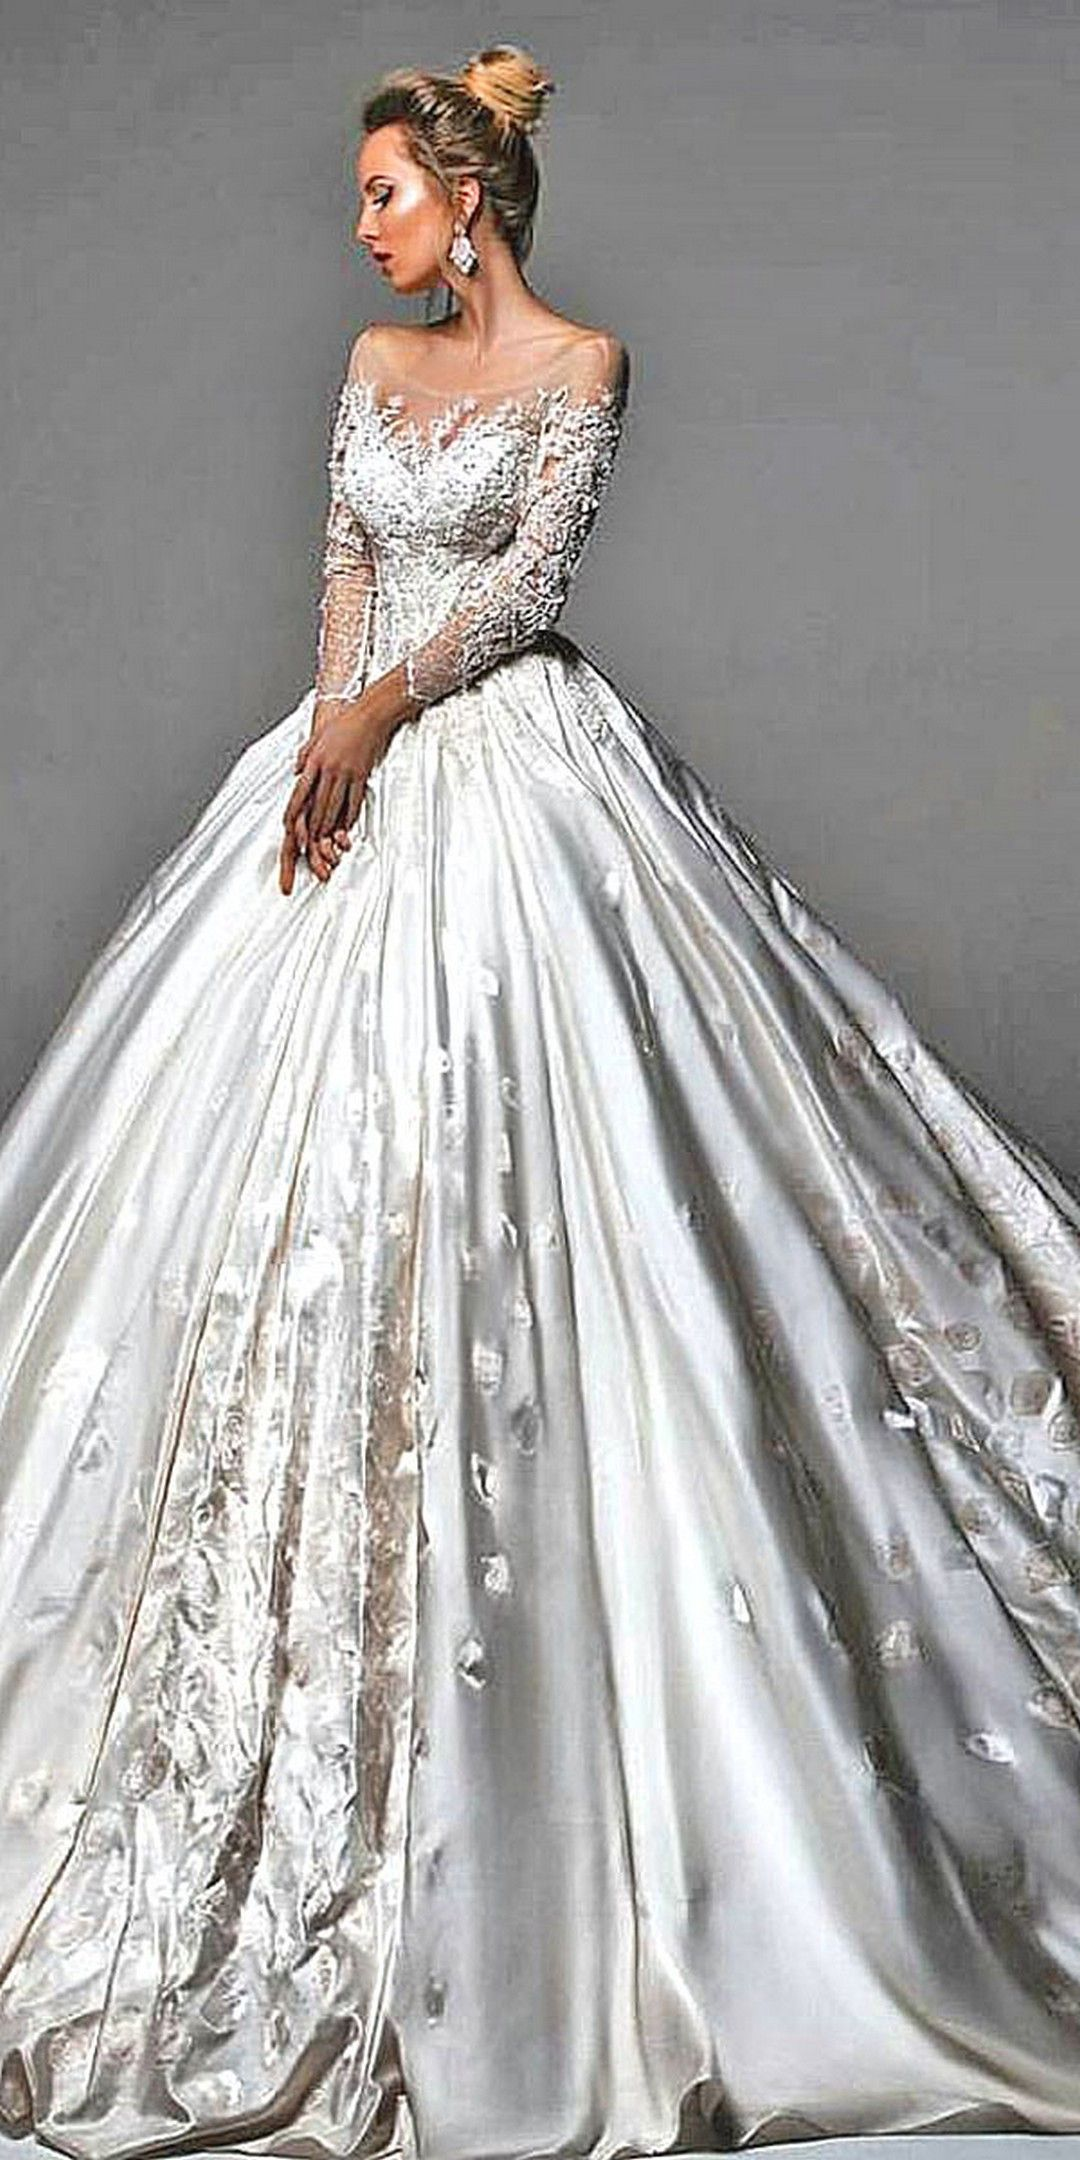 90 ideas for princess style wedding dresses